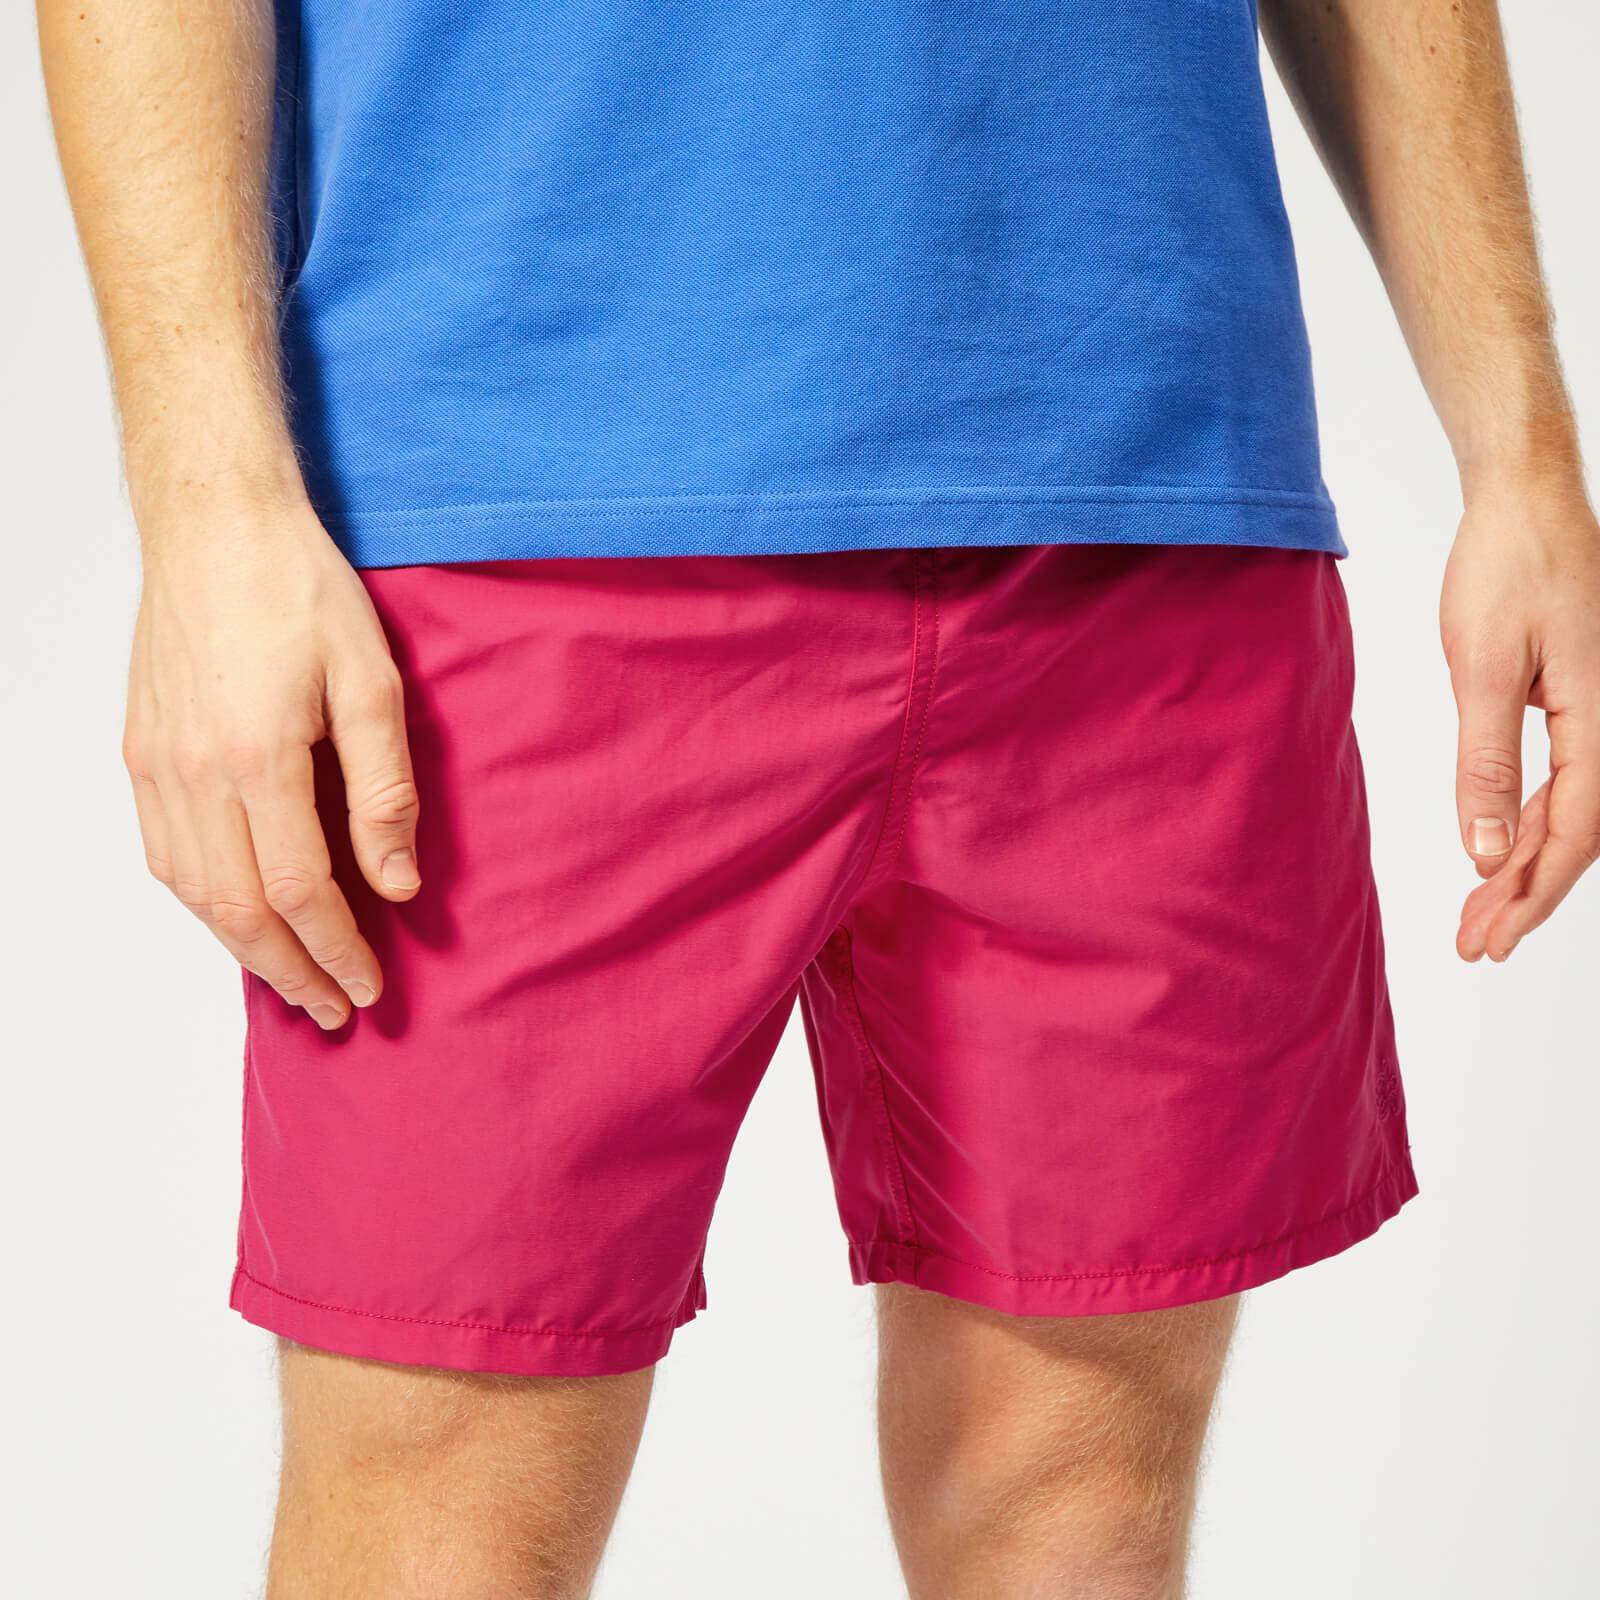 699e051fa4 Vilebrequin Men's Moorea Water Reactive Swim Shorts - Gooseberry Red